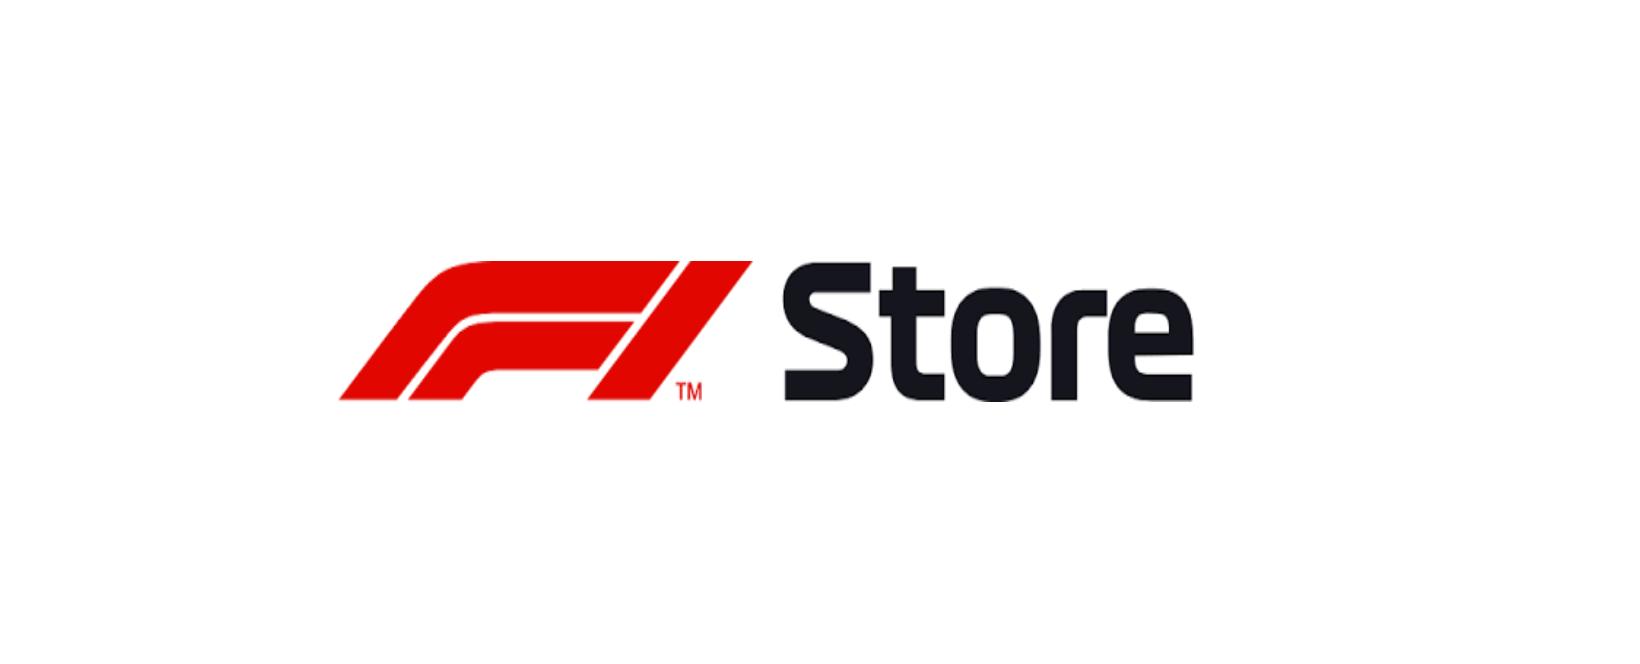 F1 Store Discount Code 2021